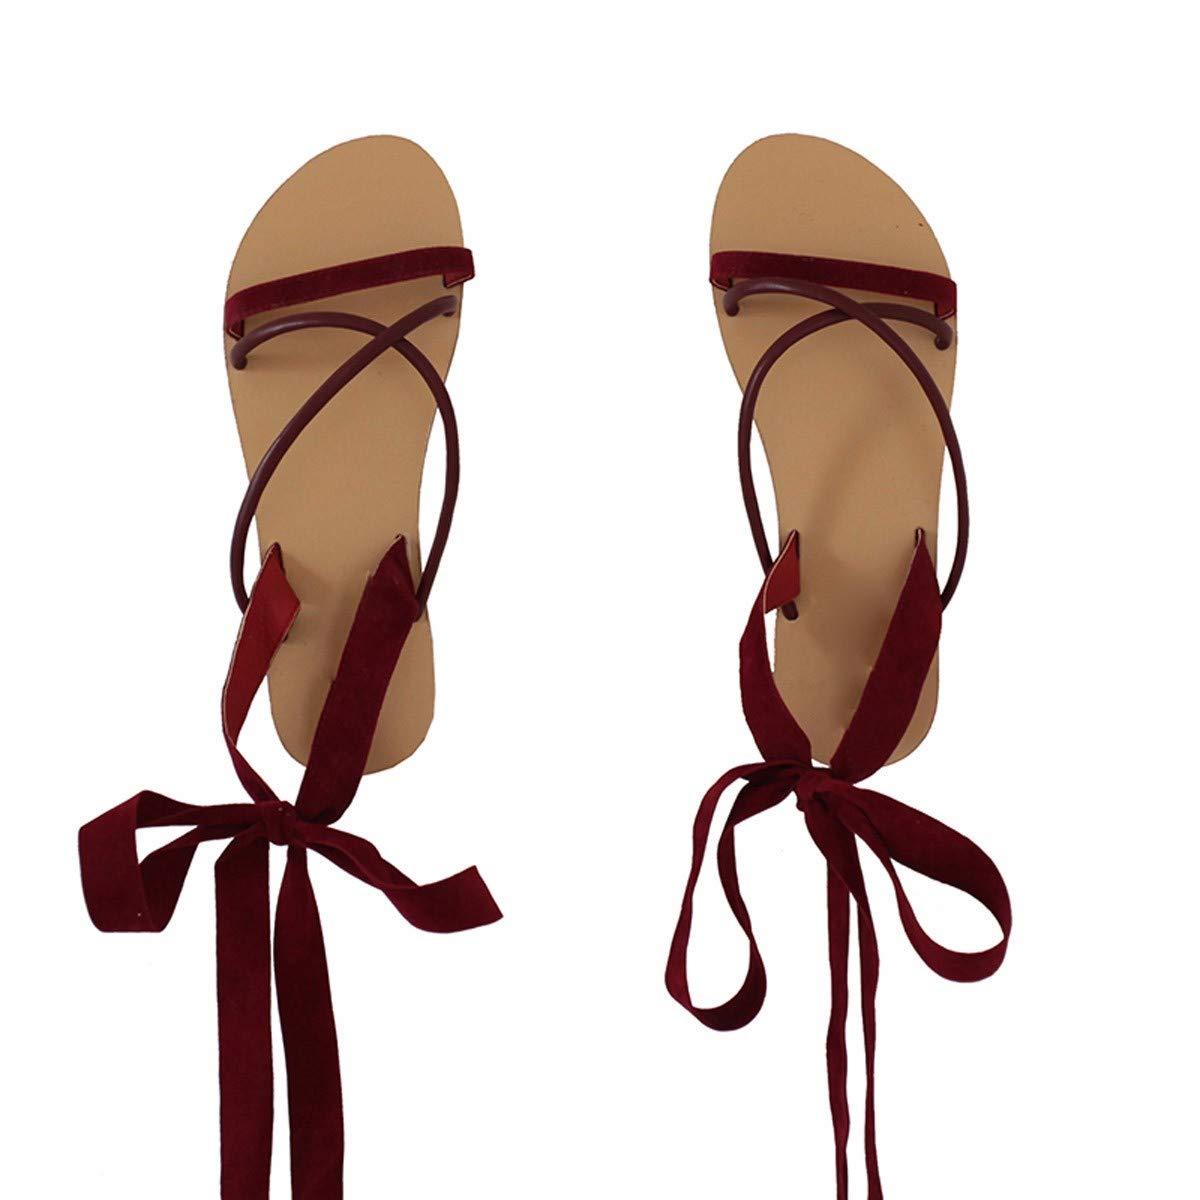 KPHY-Weiße Horizontale Balken Weiße Schuhe Zehen Rom Flache Schuhe Damenschuhe.